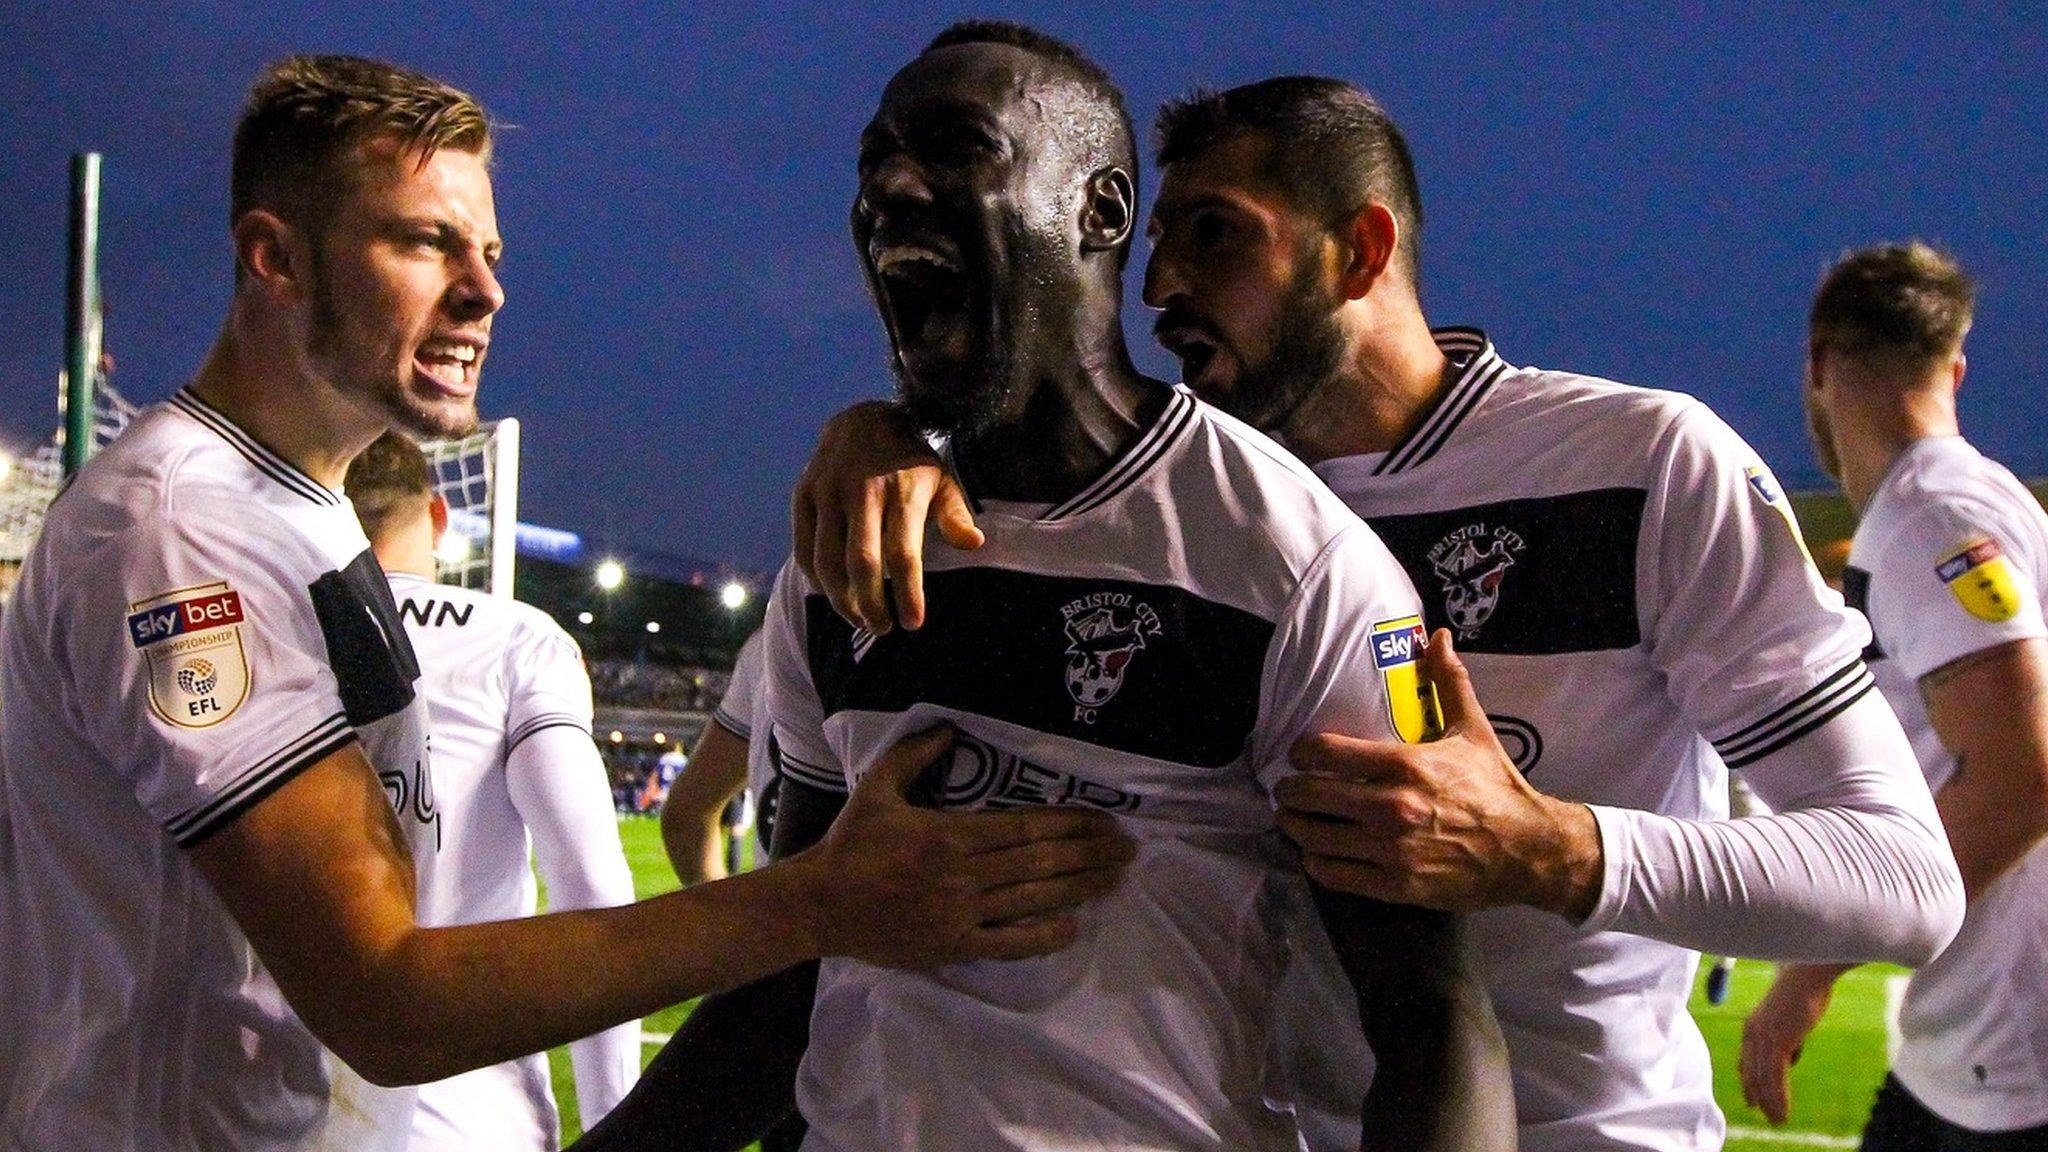 Birmingham City 0-1 Bristol City: Diedhiou goal earns win for Robins